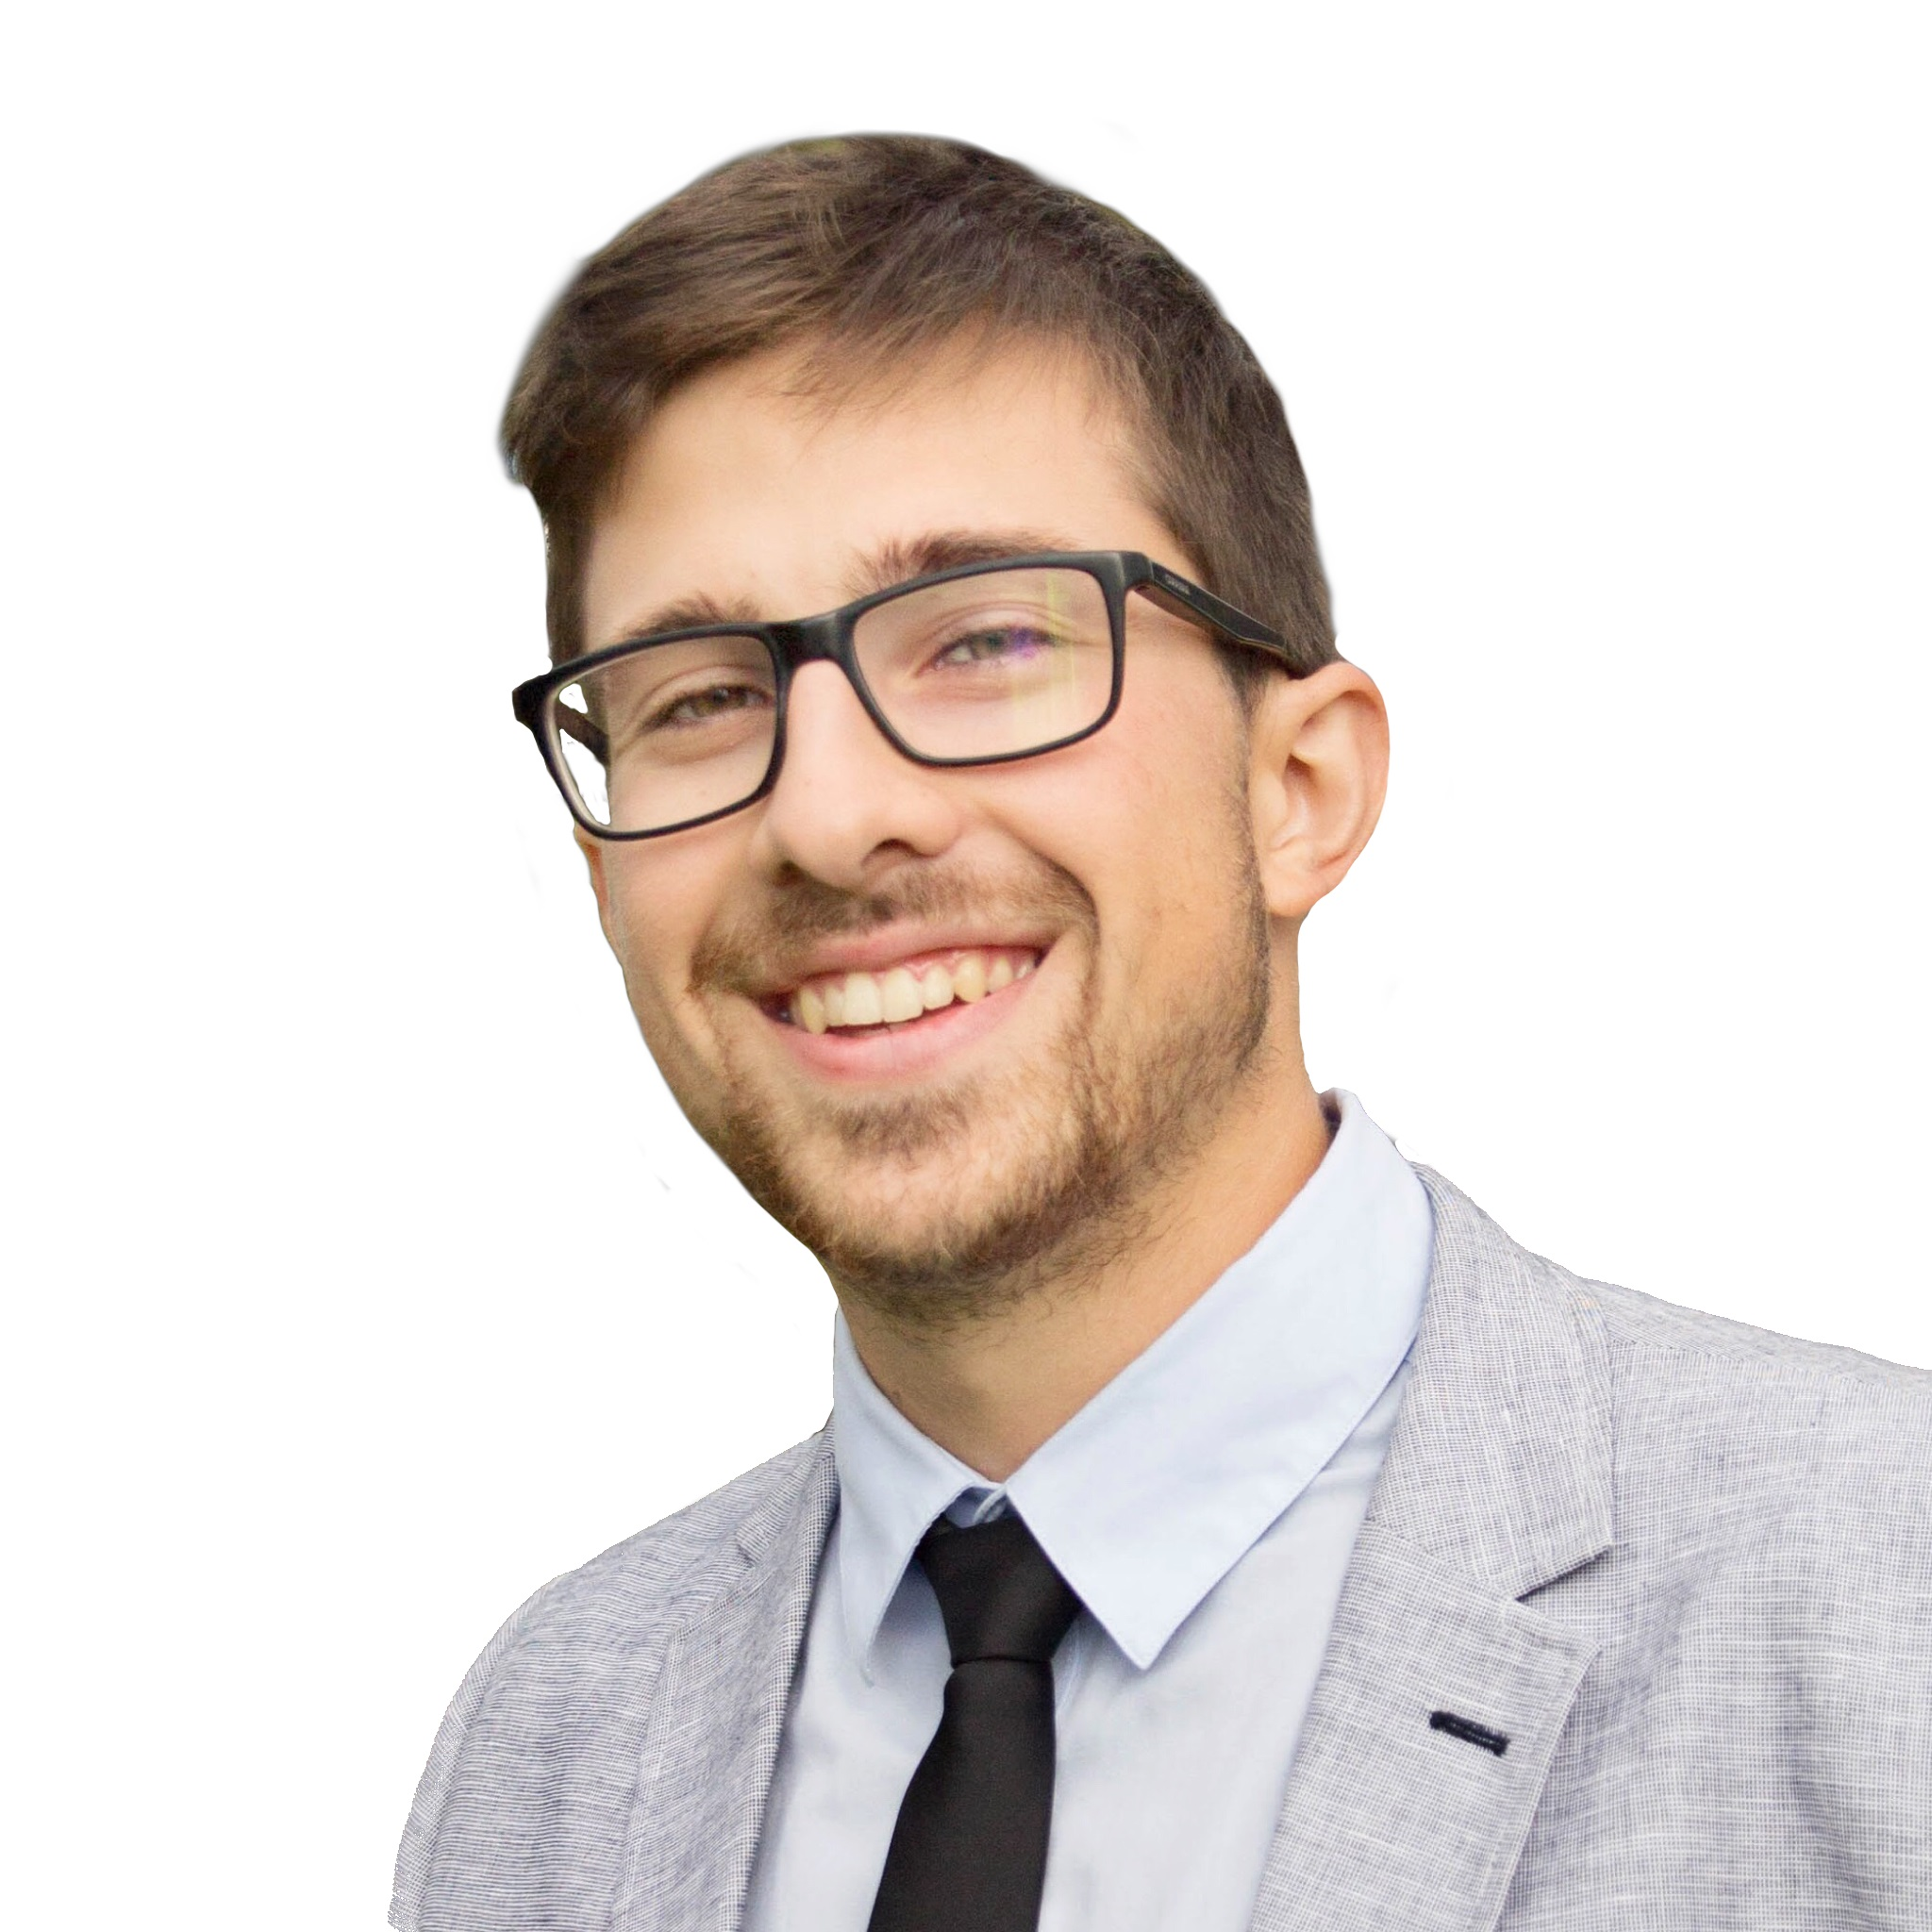 David Molnar